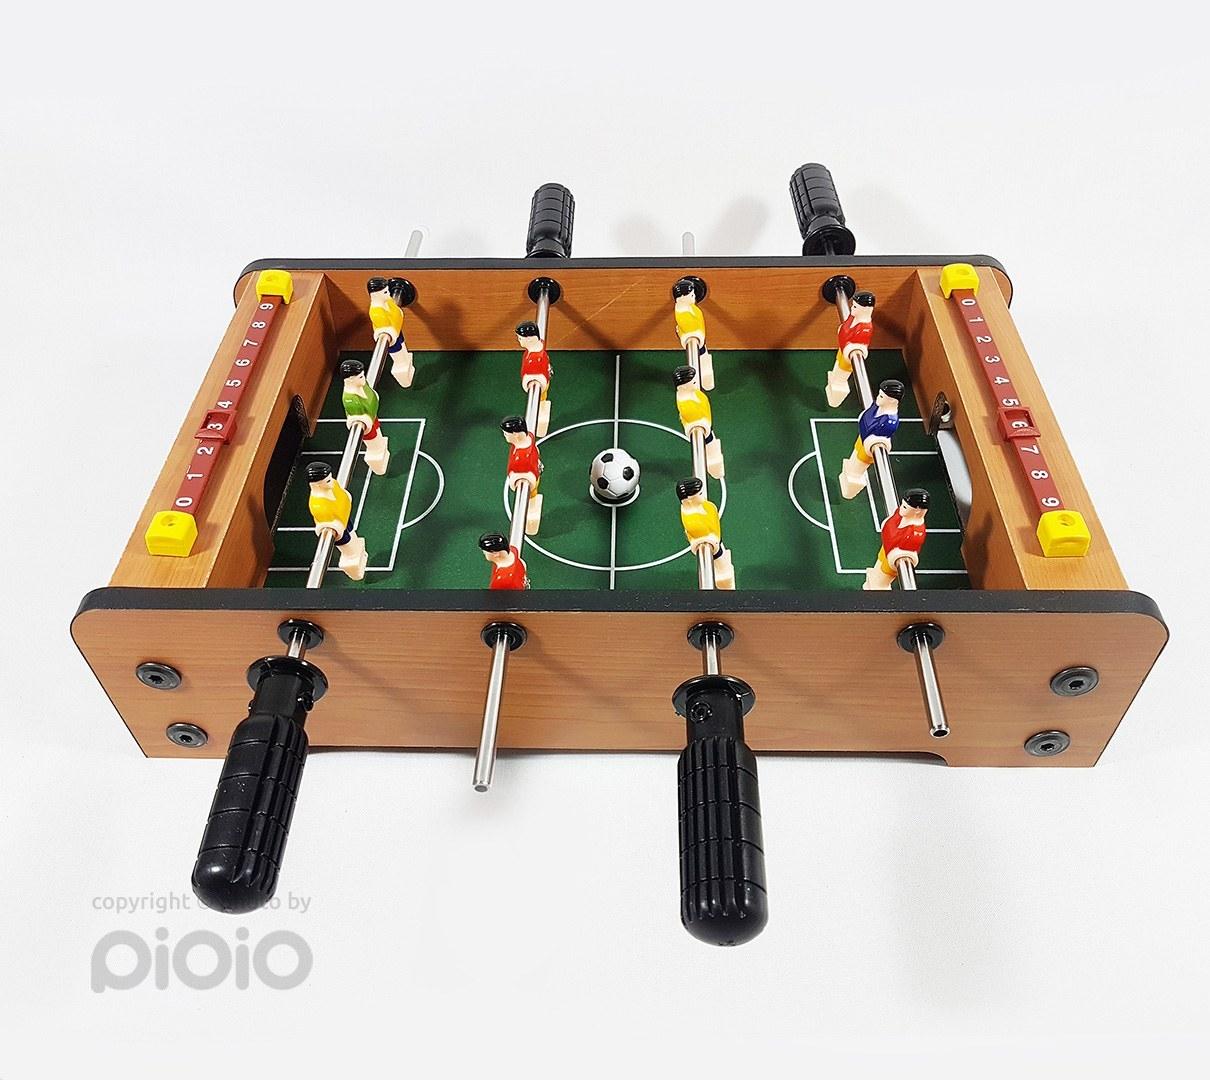 فوتبال دستی مدل xj